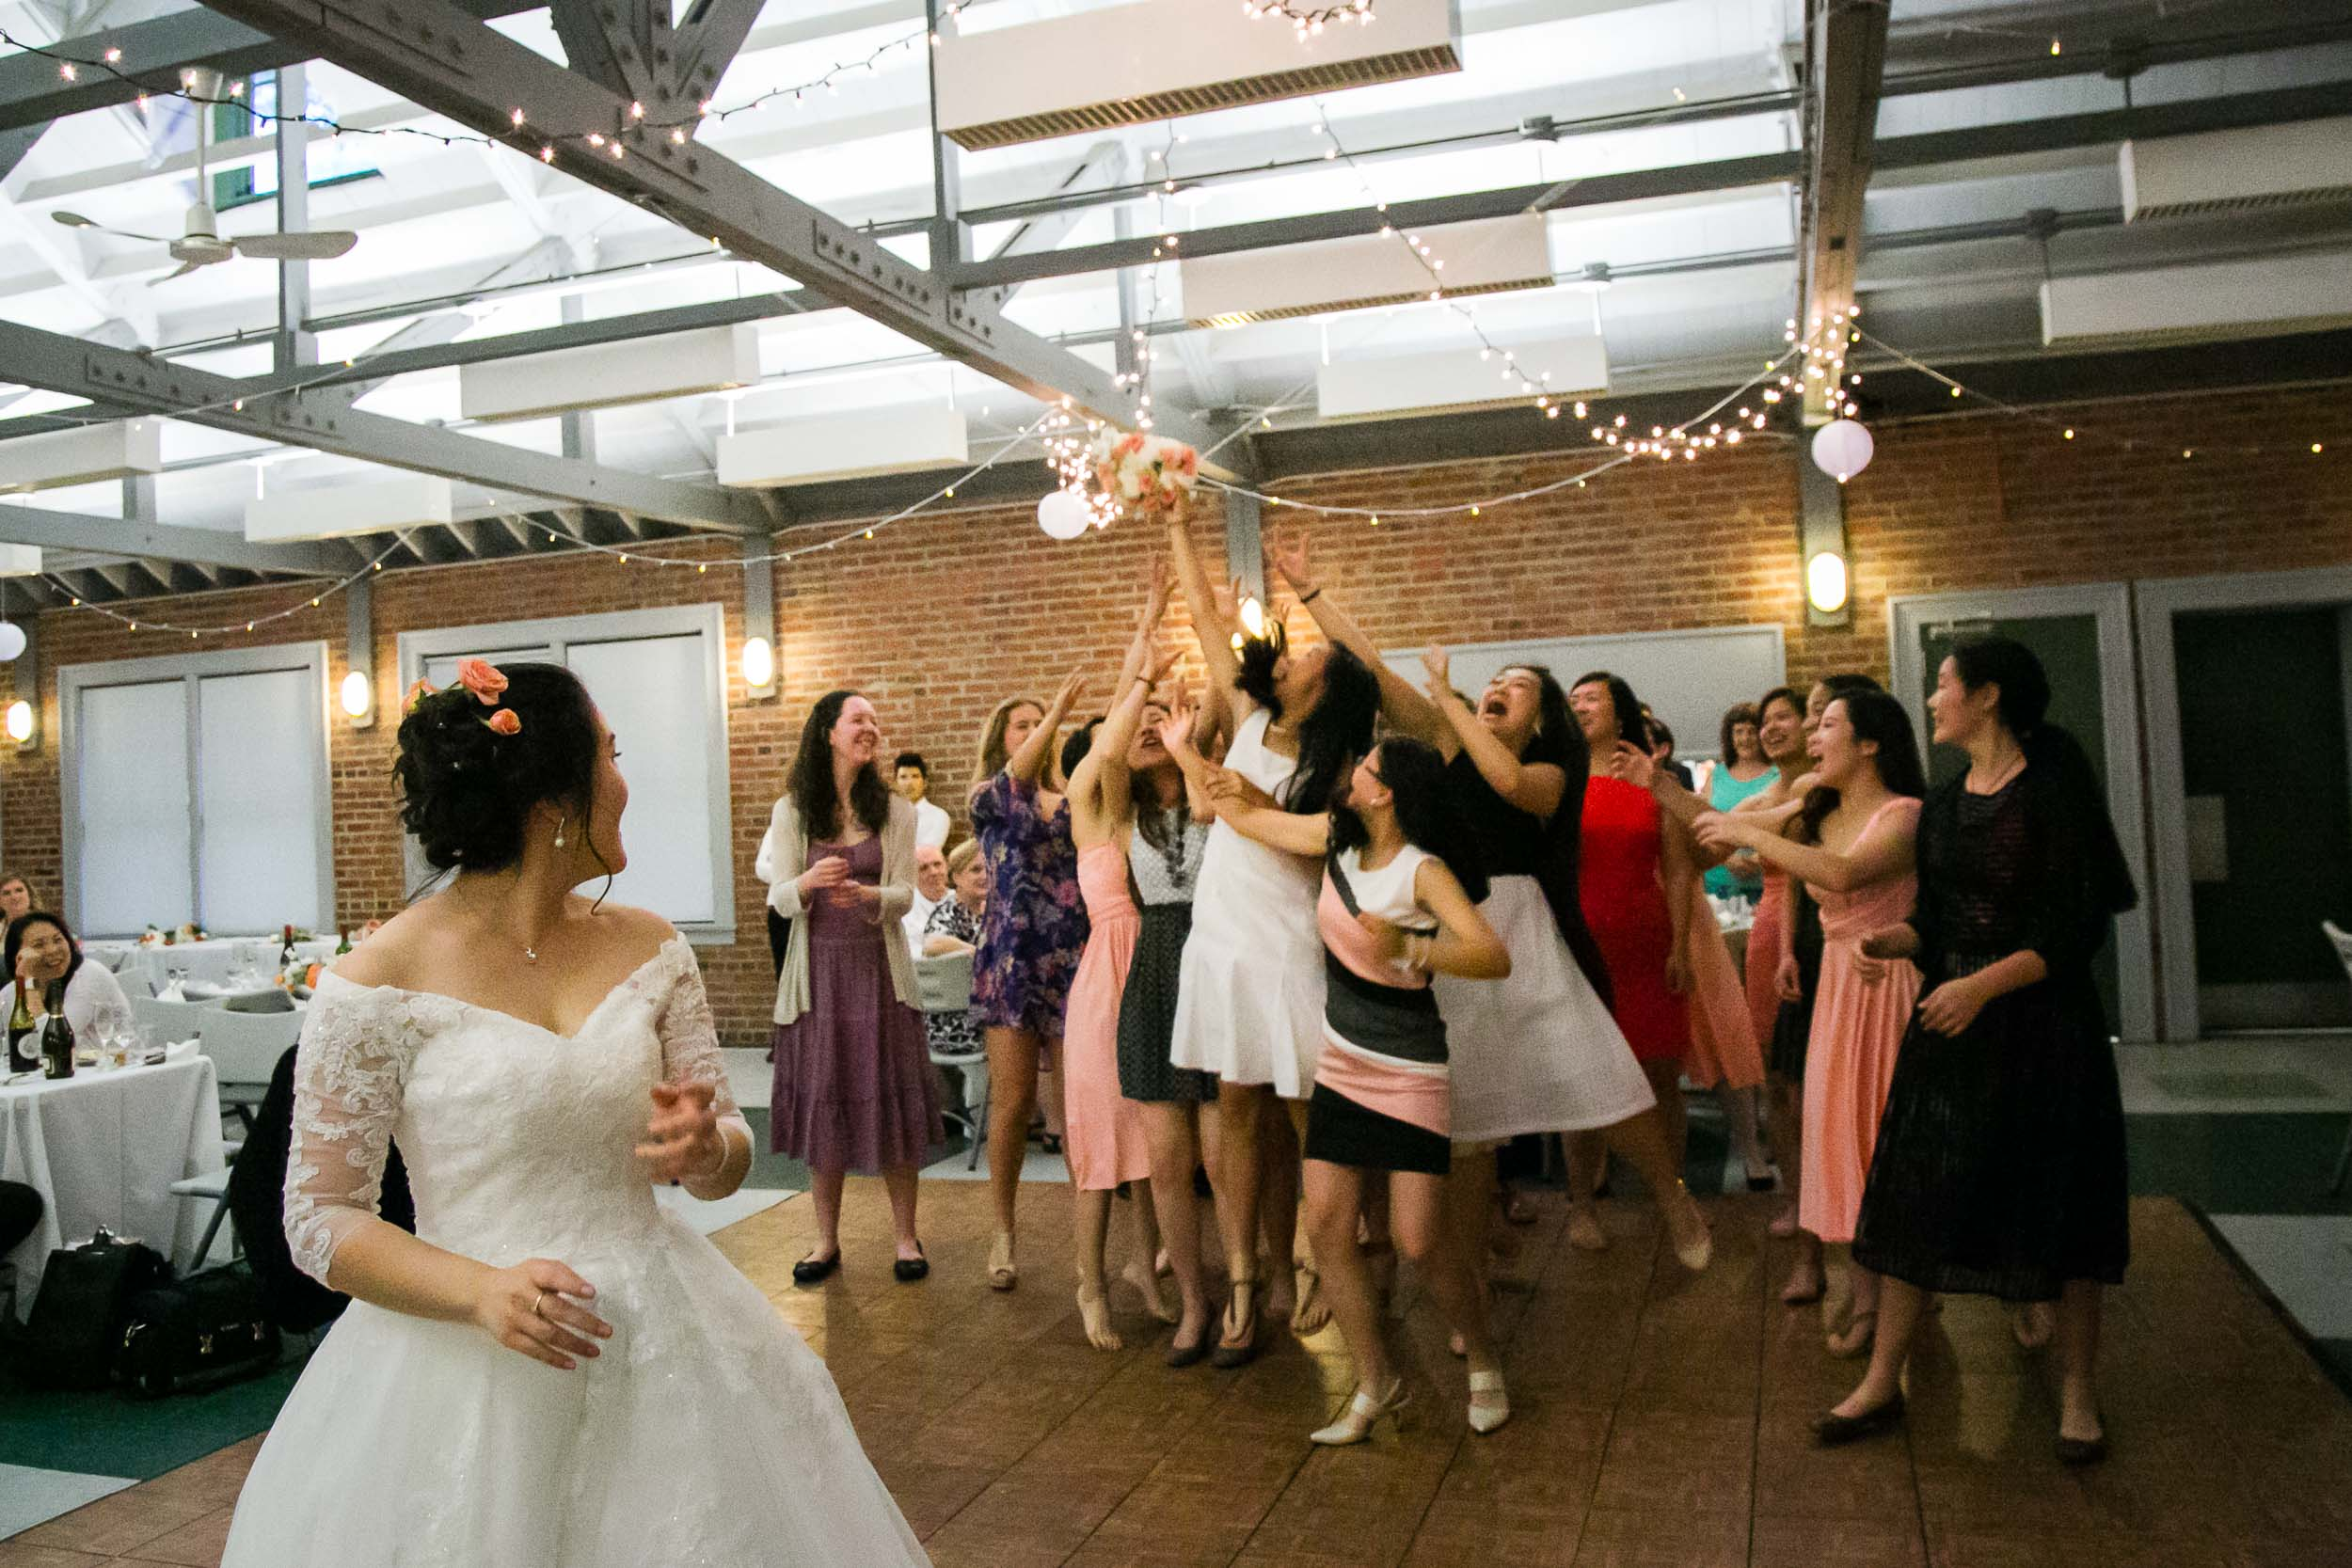 Raleigh Wedding Photographer | G. Lin Photography | Girls catching the wedding bouquet